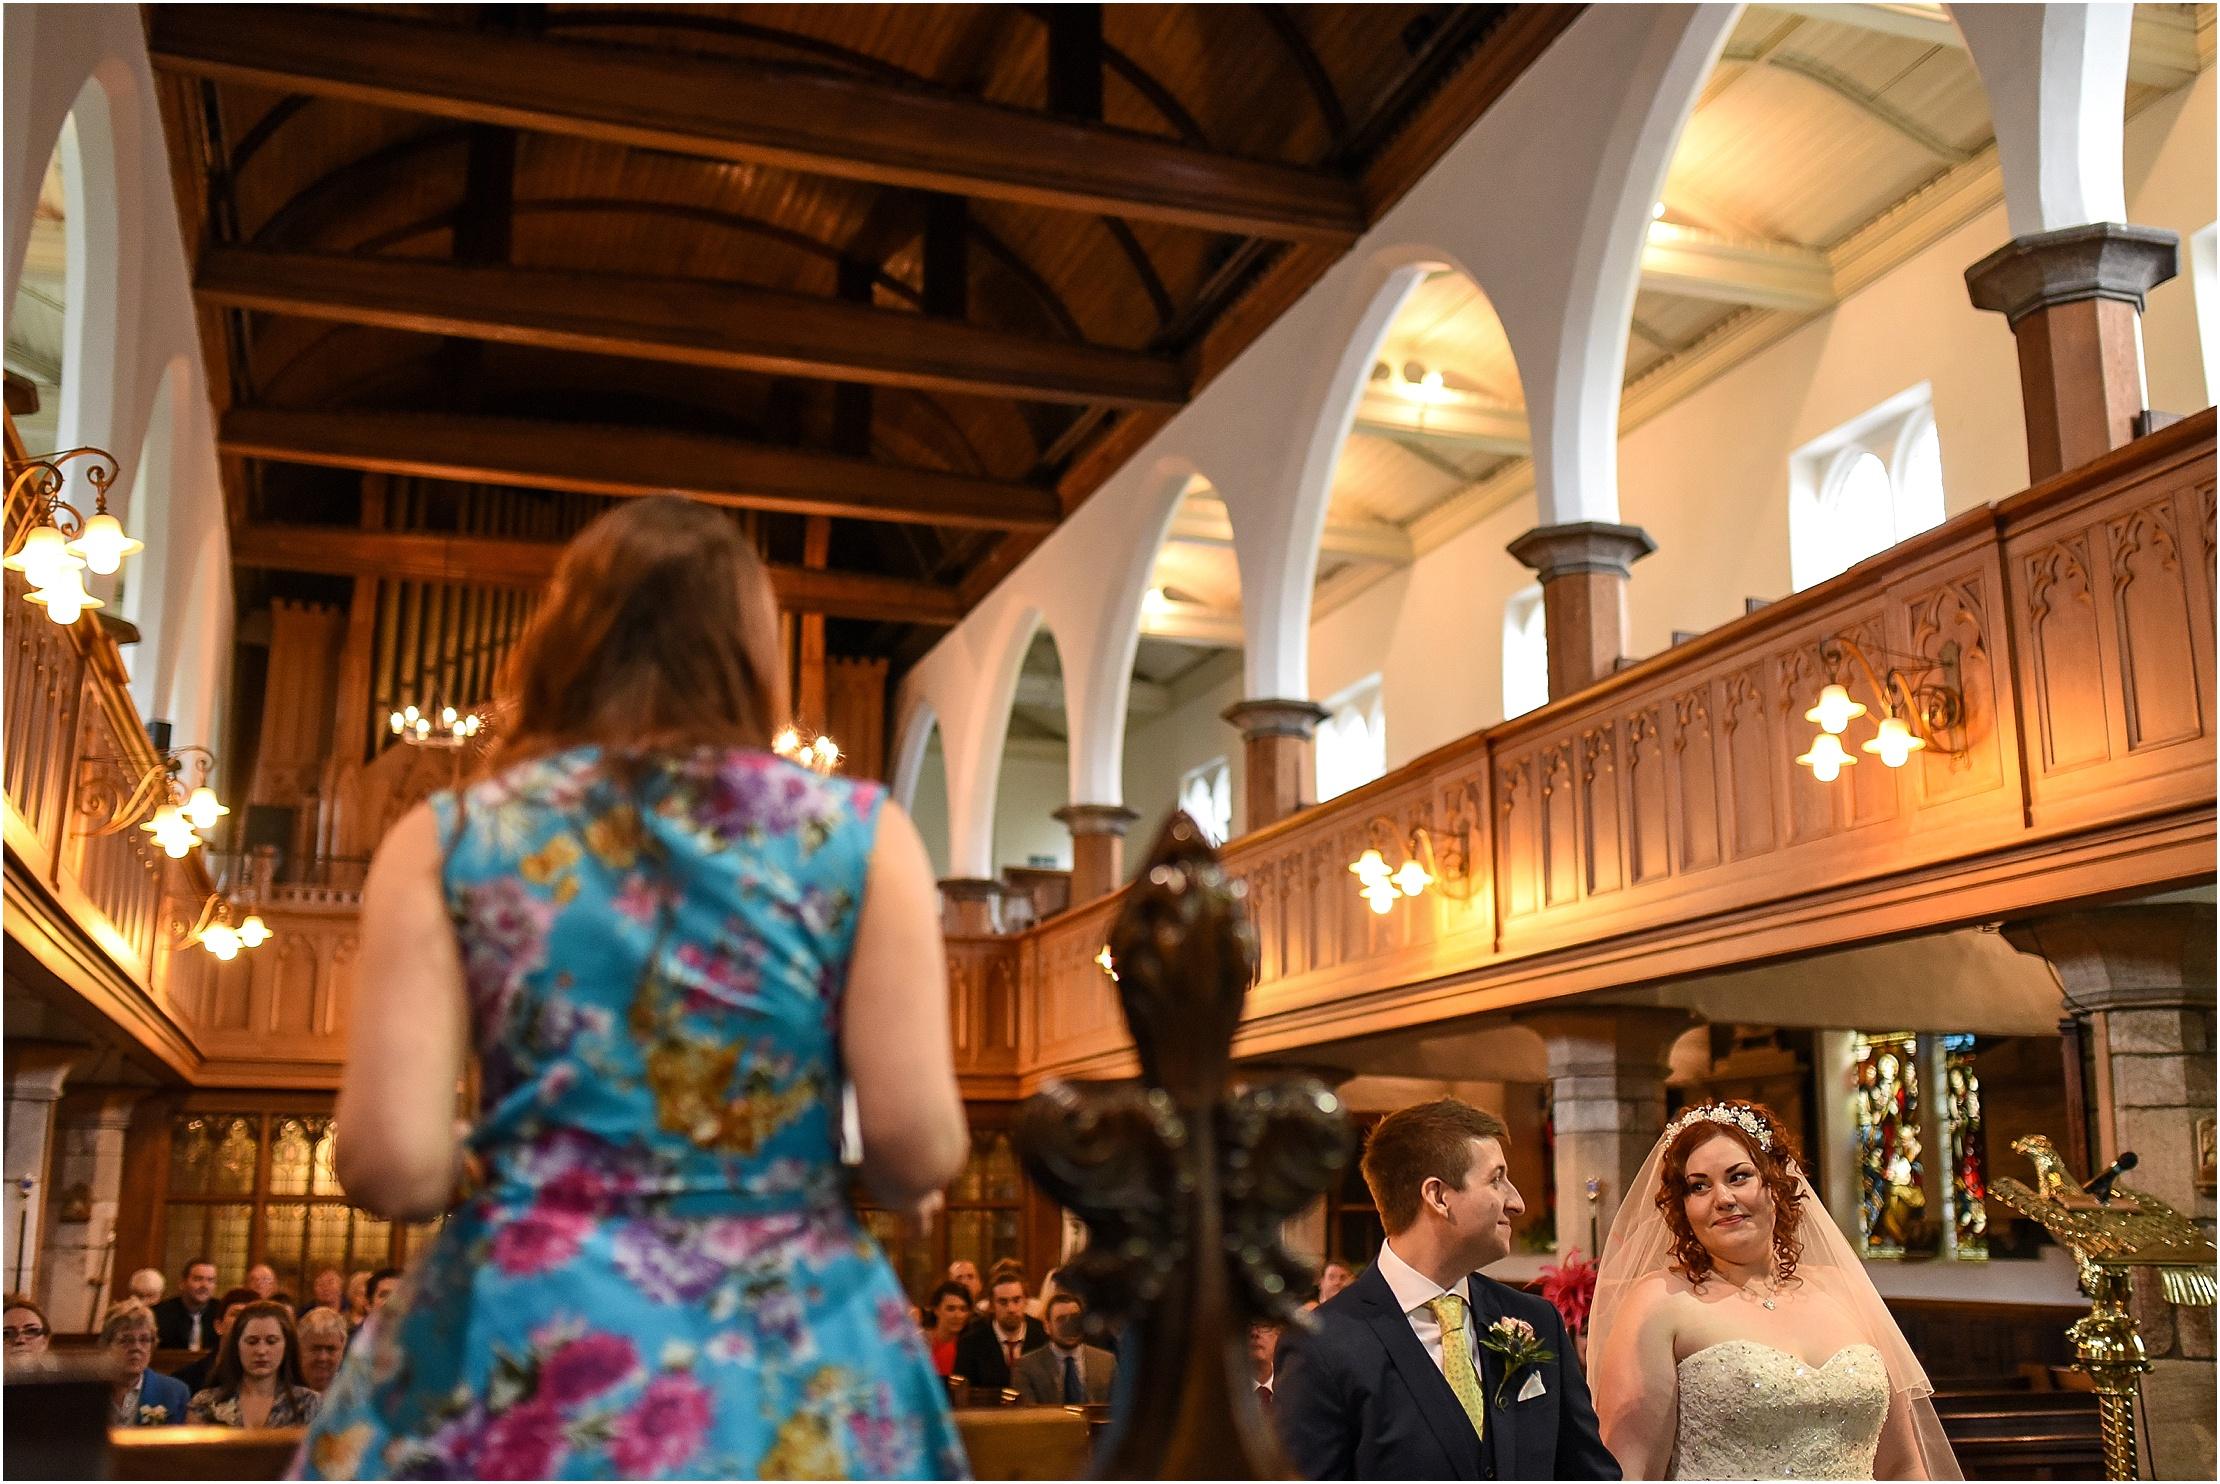 shireburn-arms-wedding- 049.jpg